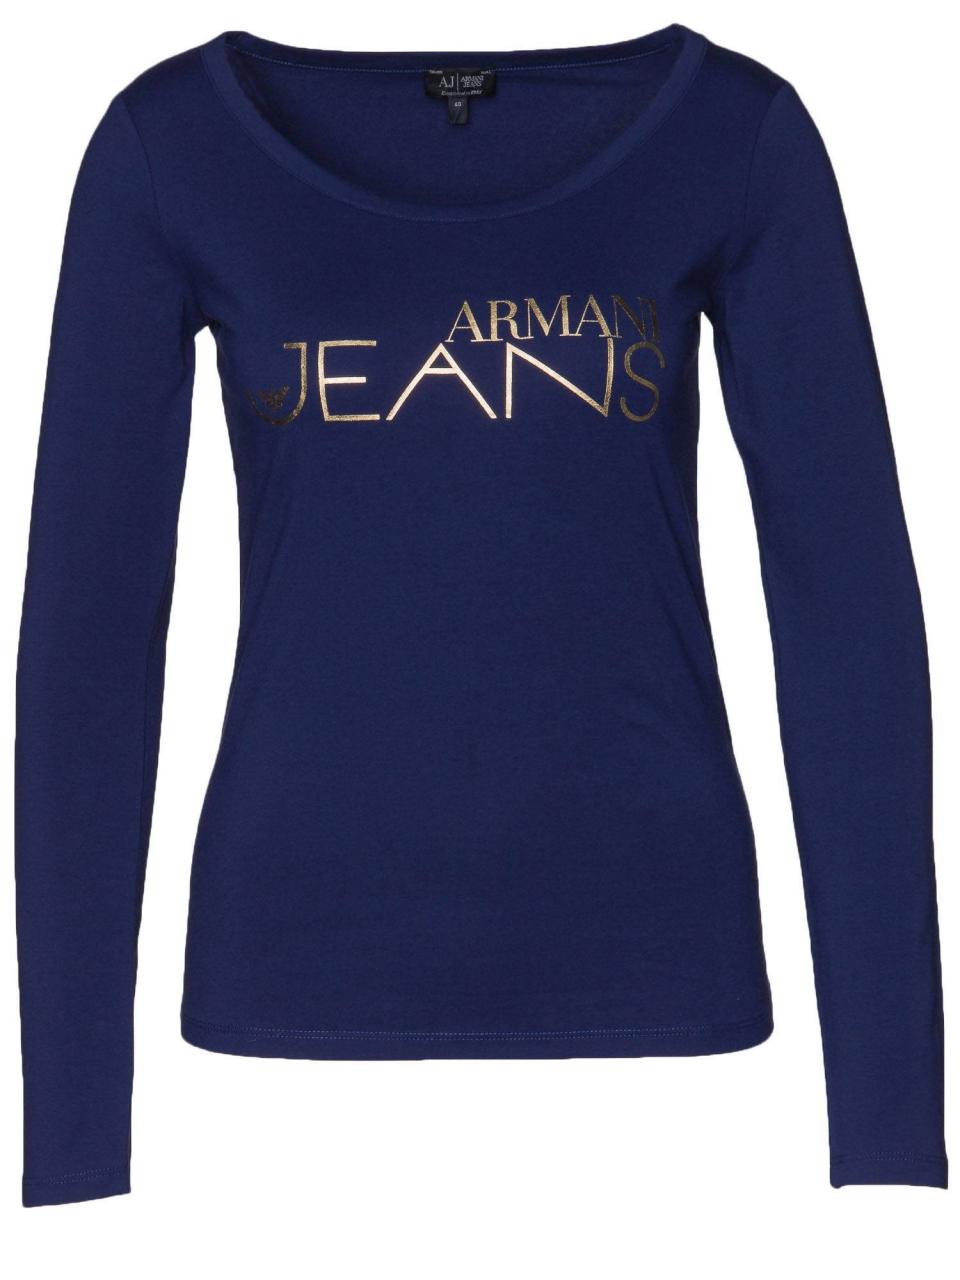 ARMANI JEANS Langarm-Shirt